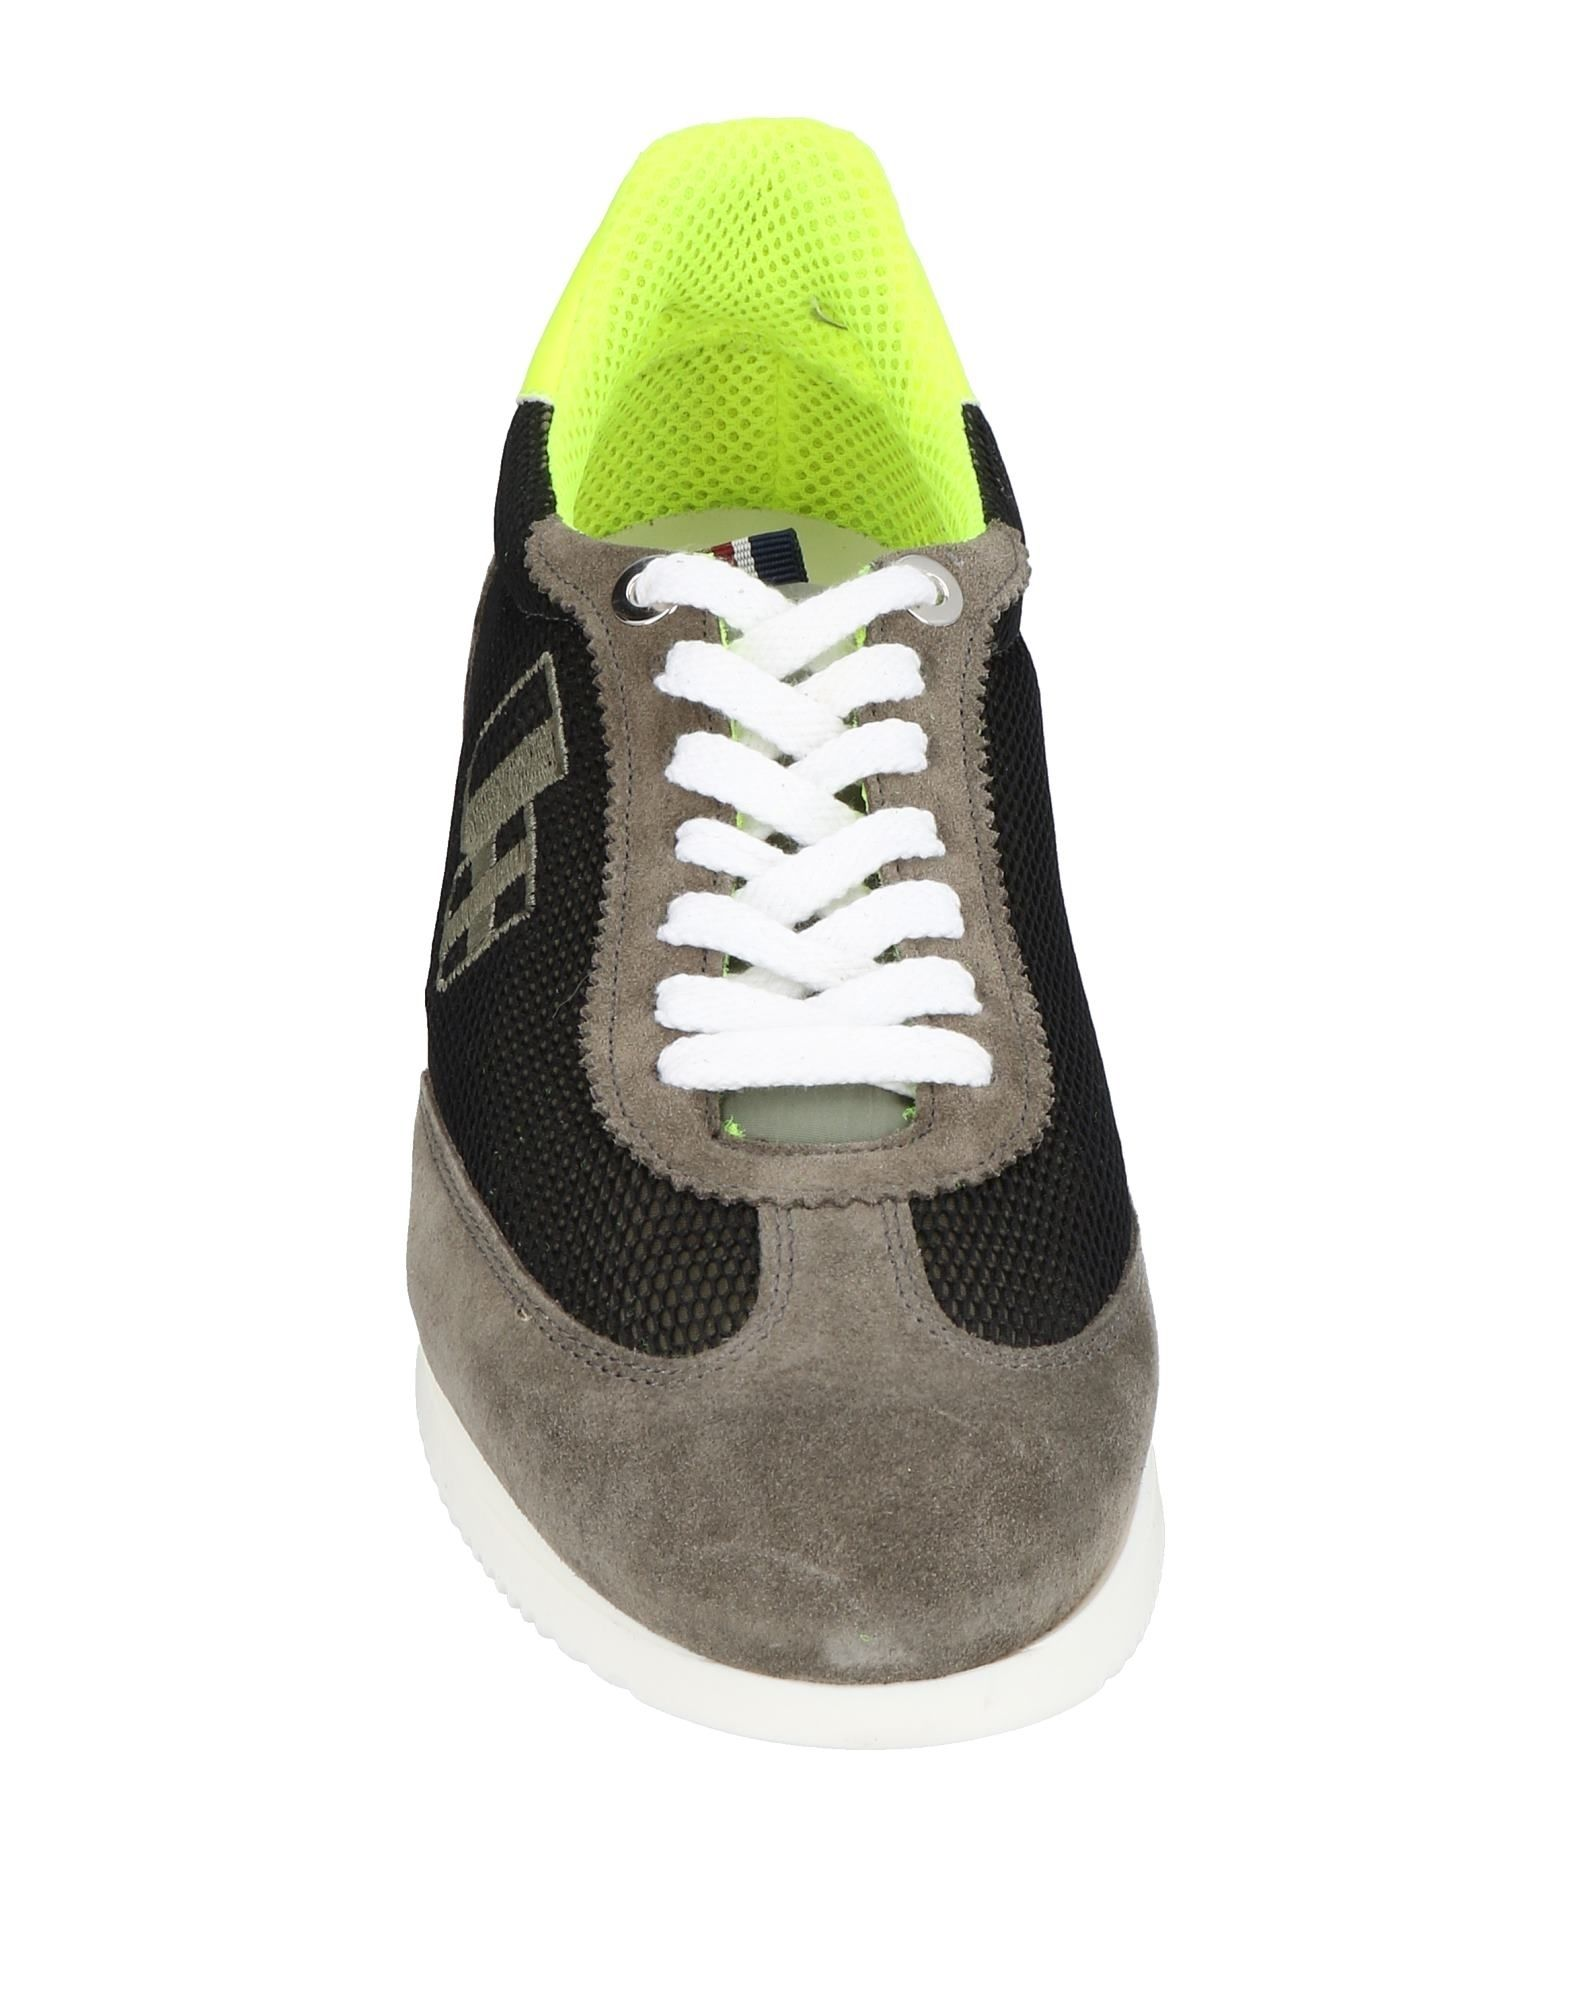 D'Acquasparta Herren Sneakers Herren D'Acquasparta  11467949SX Heiße Schuhe 92087f